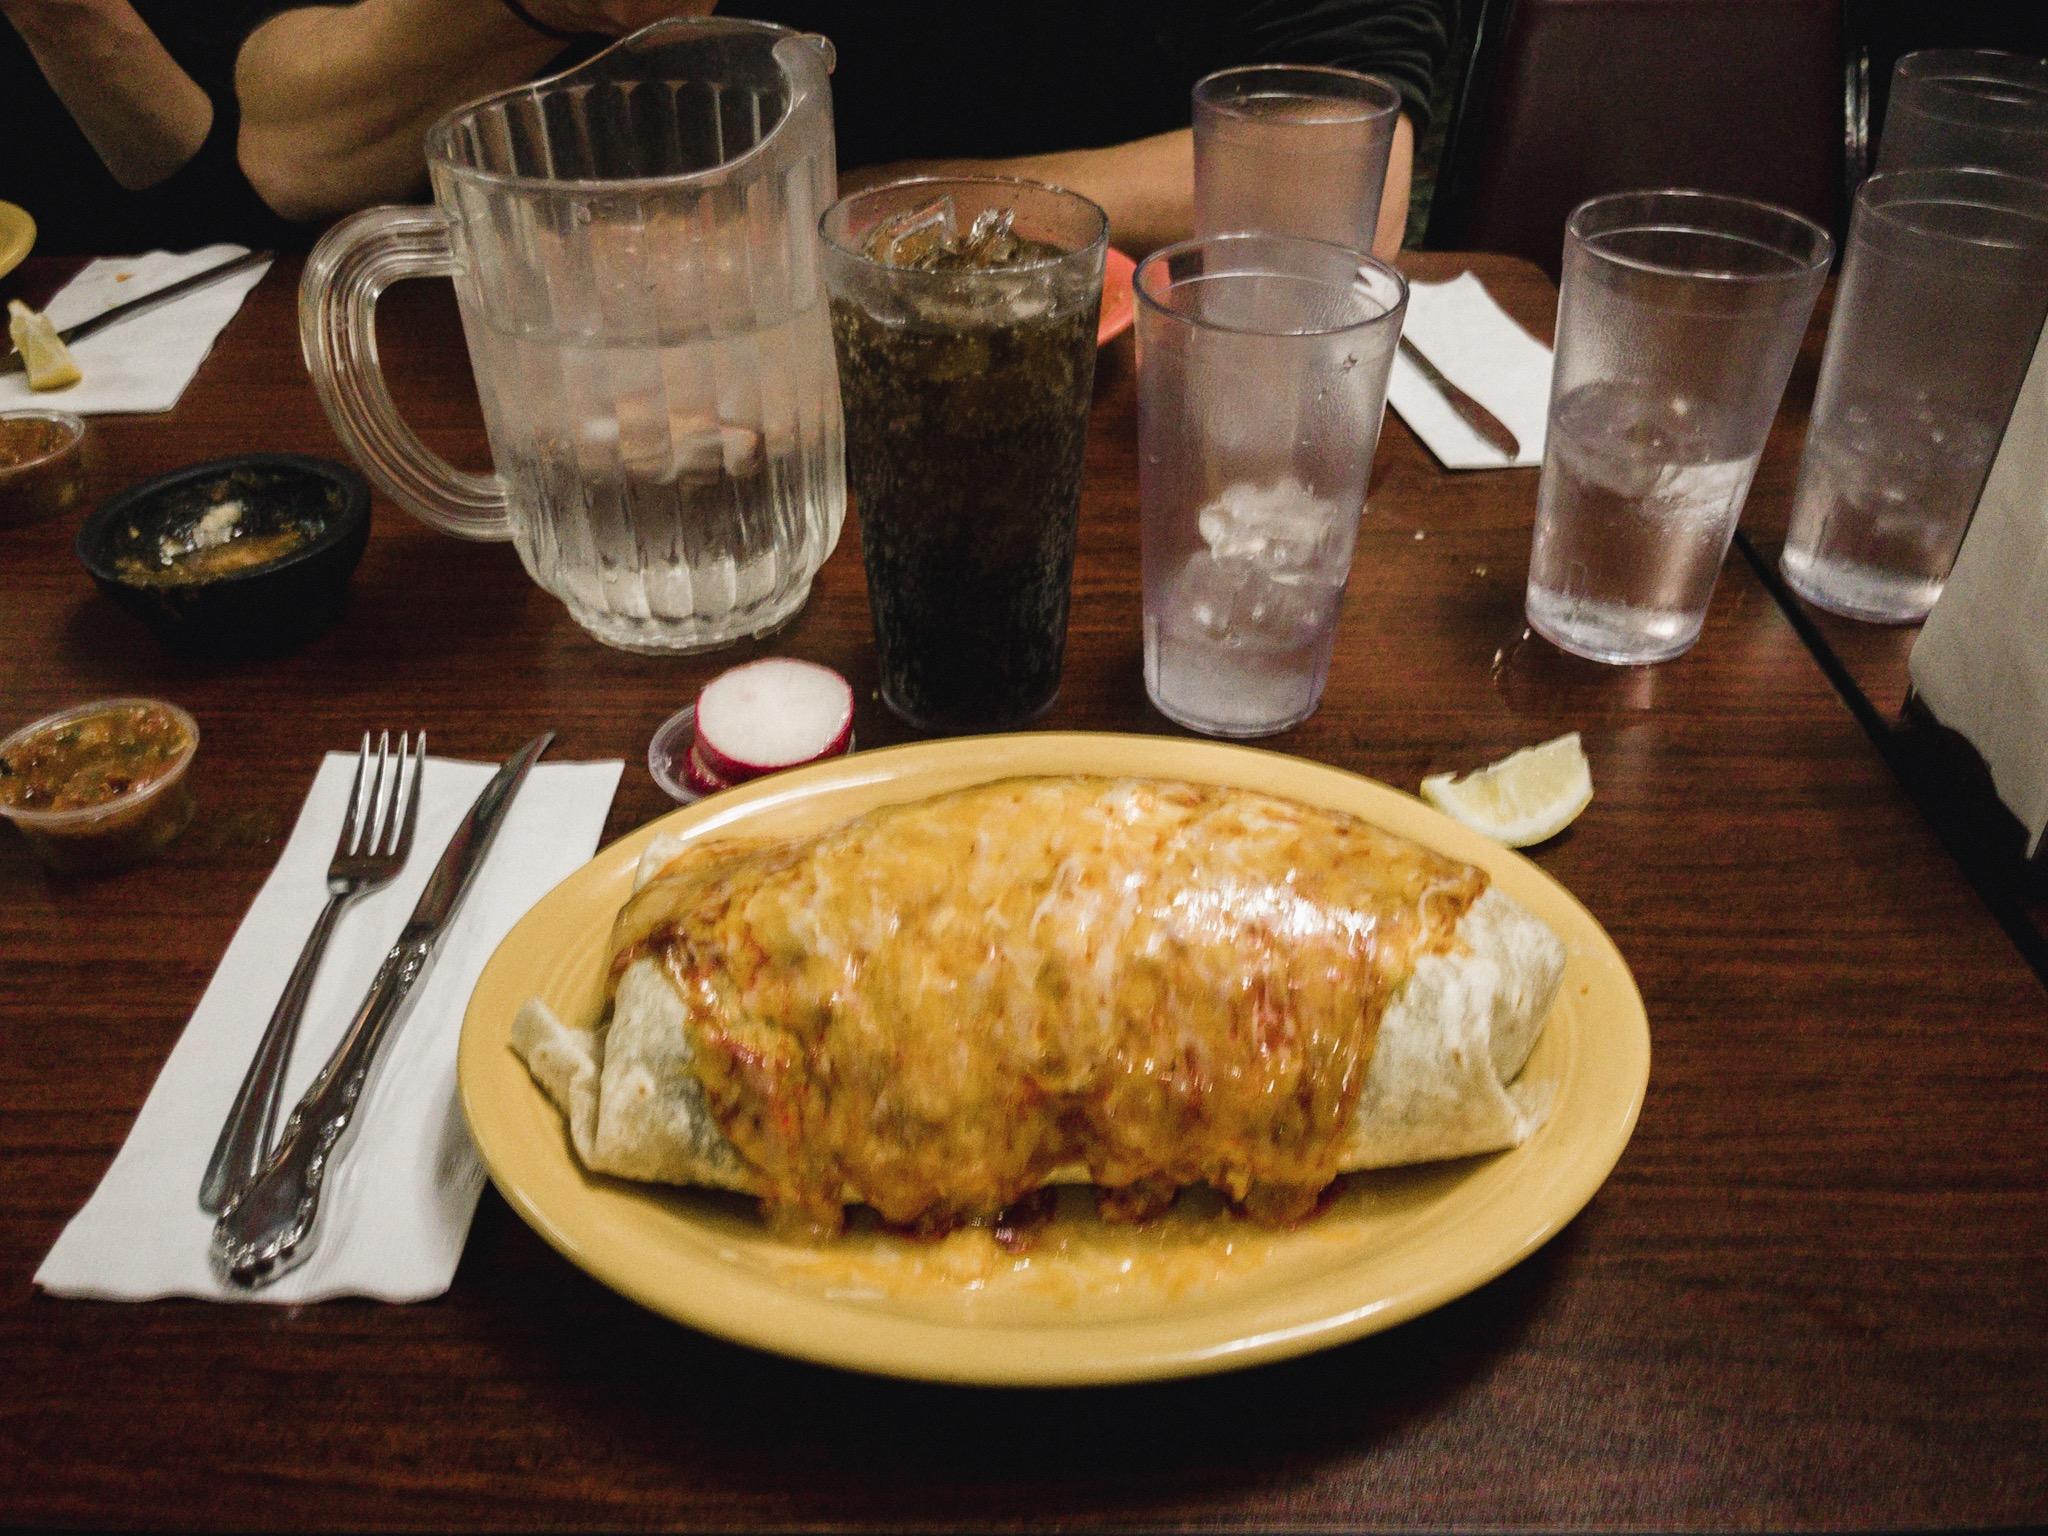 2.5lbs burrito.